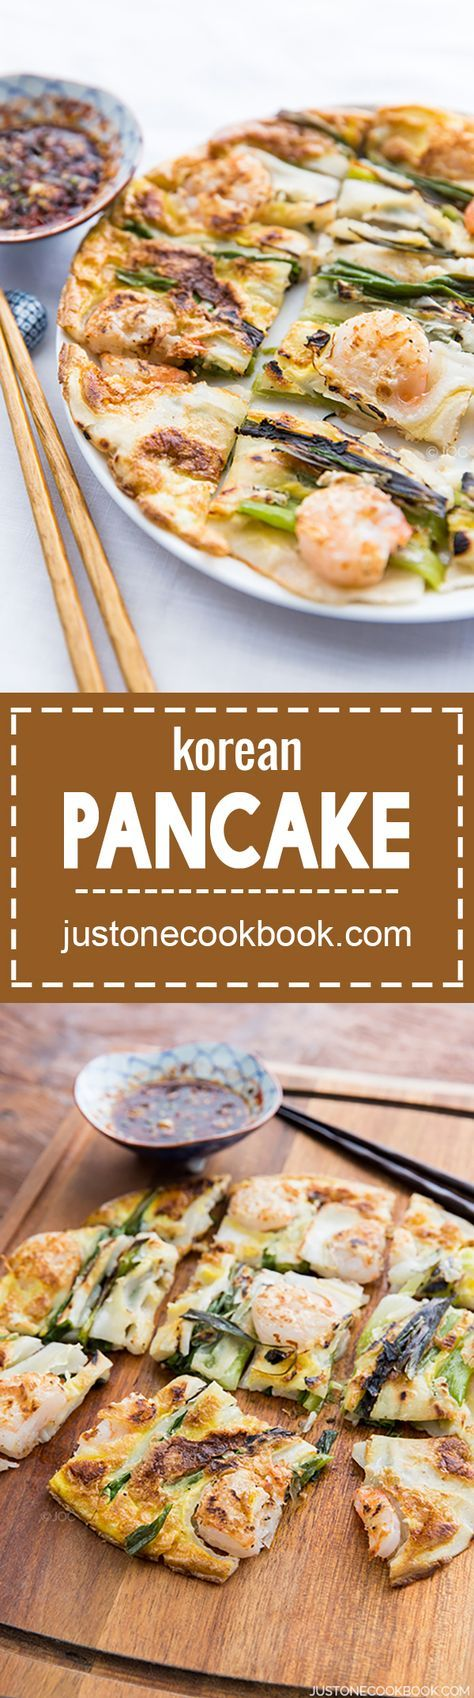 120 best korean food images on pinterest korean food recipes korean pancake korean food recipeseasy forumfinder Choice Image